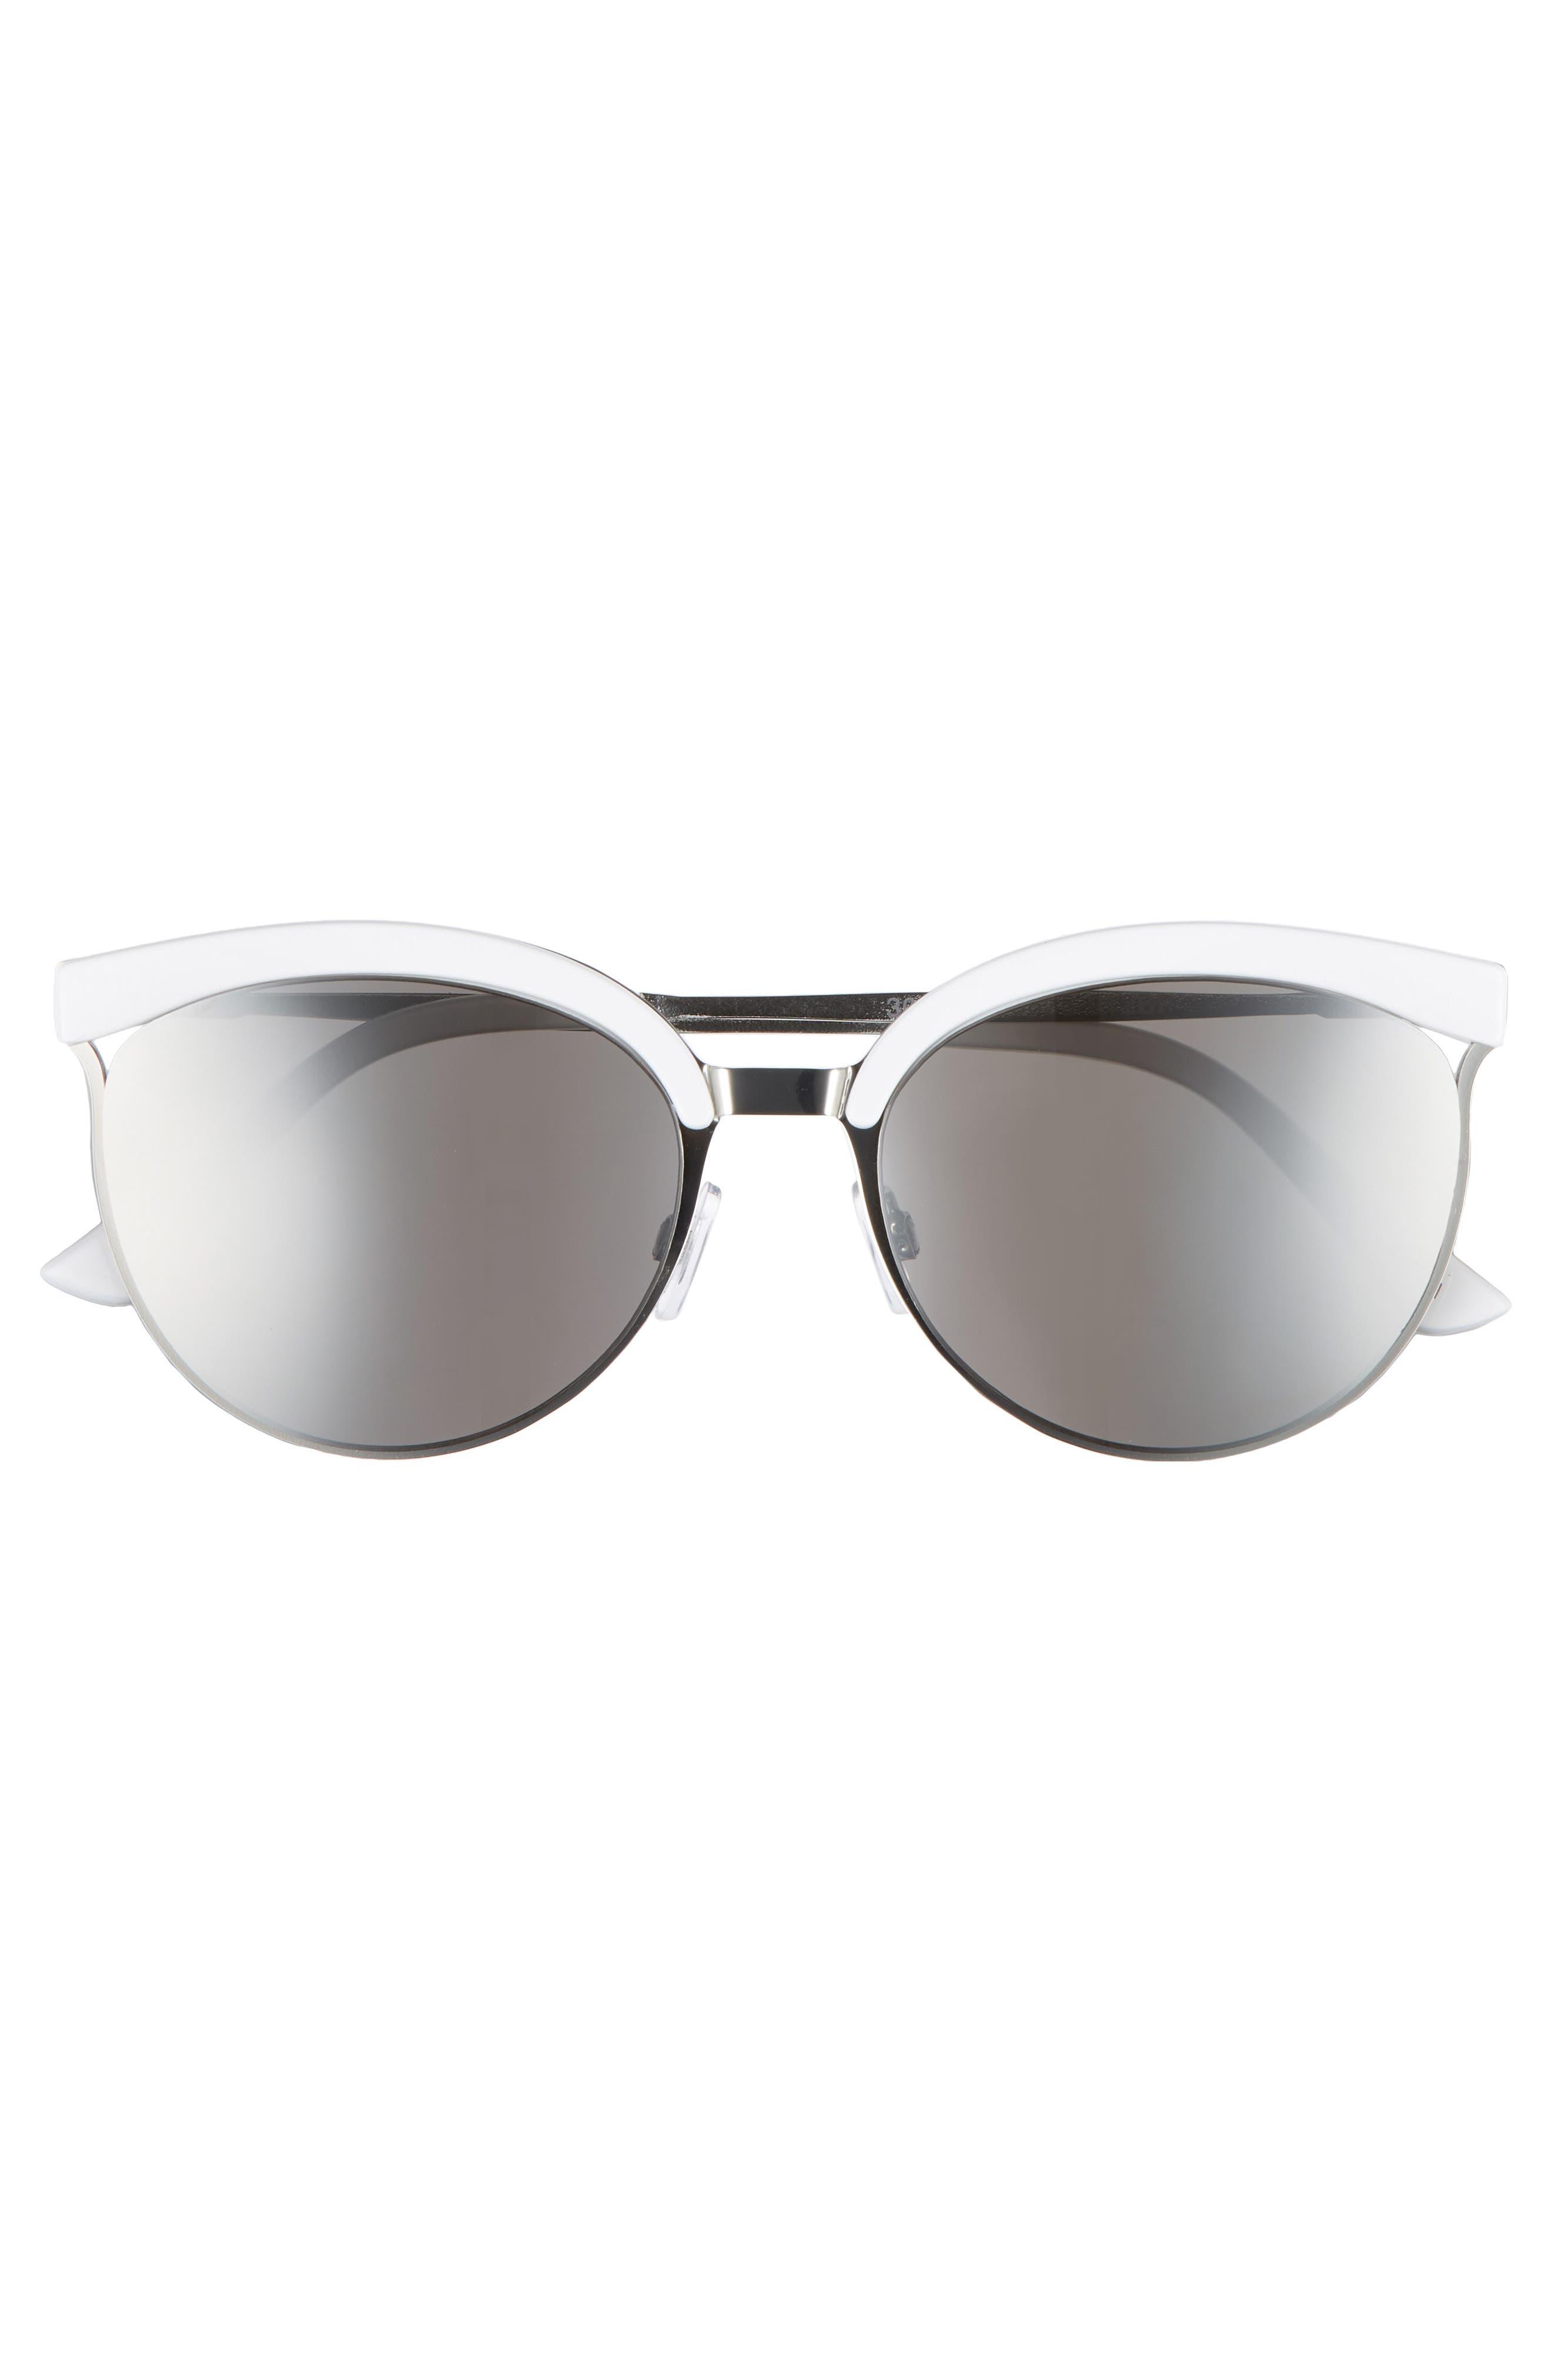 57mm Round Sunglasses,                             Alternate thumbnail 3, color,                             100